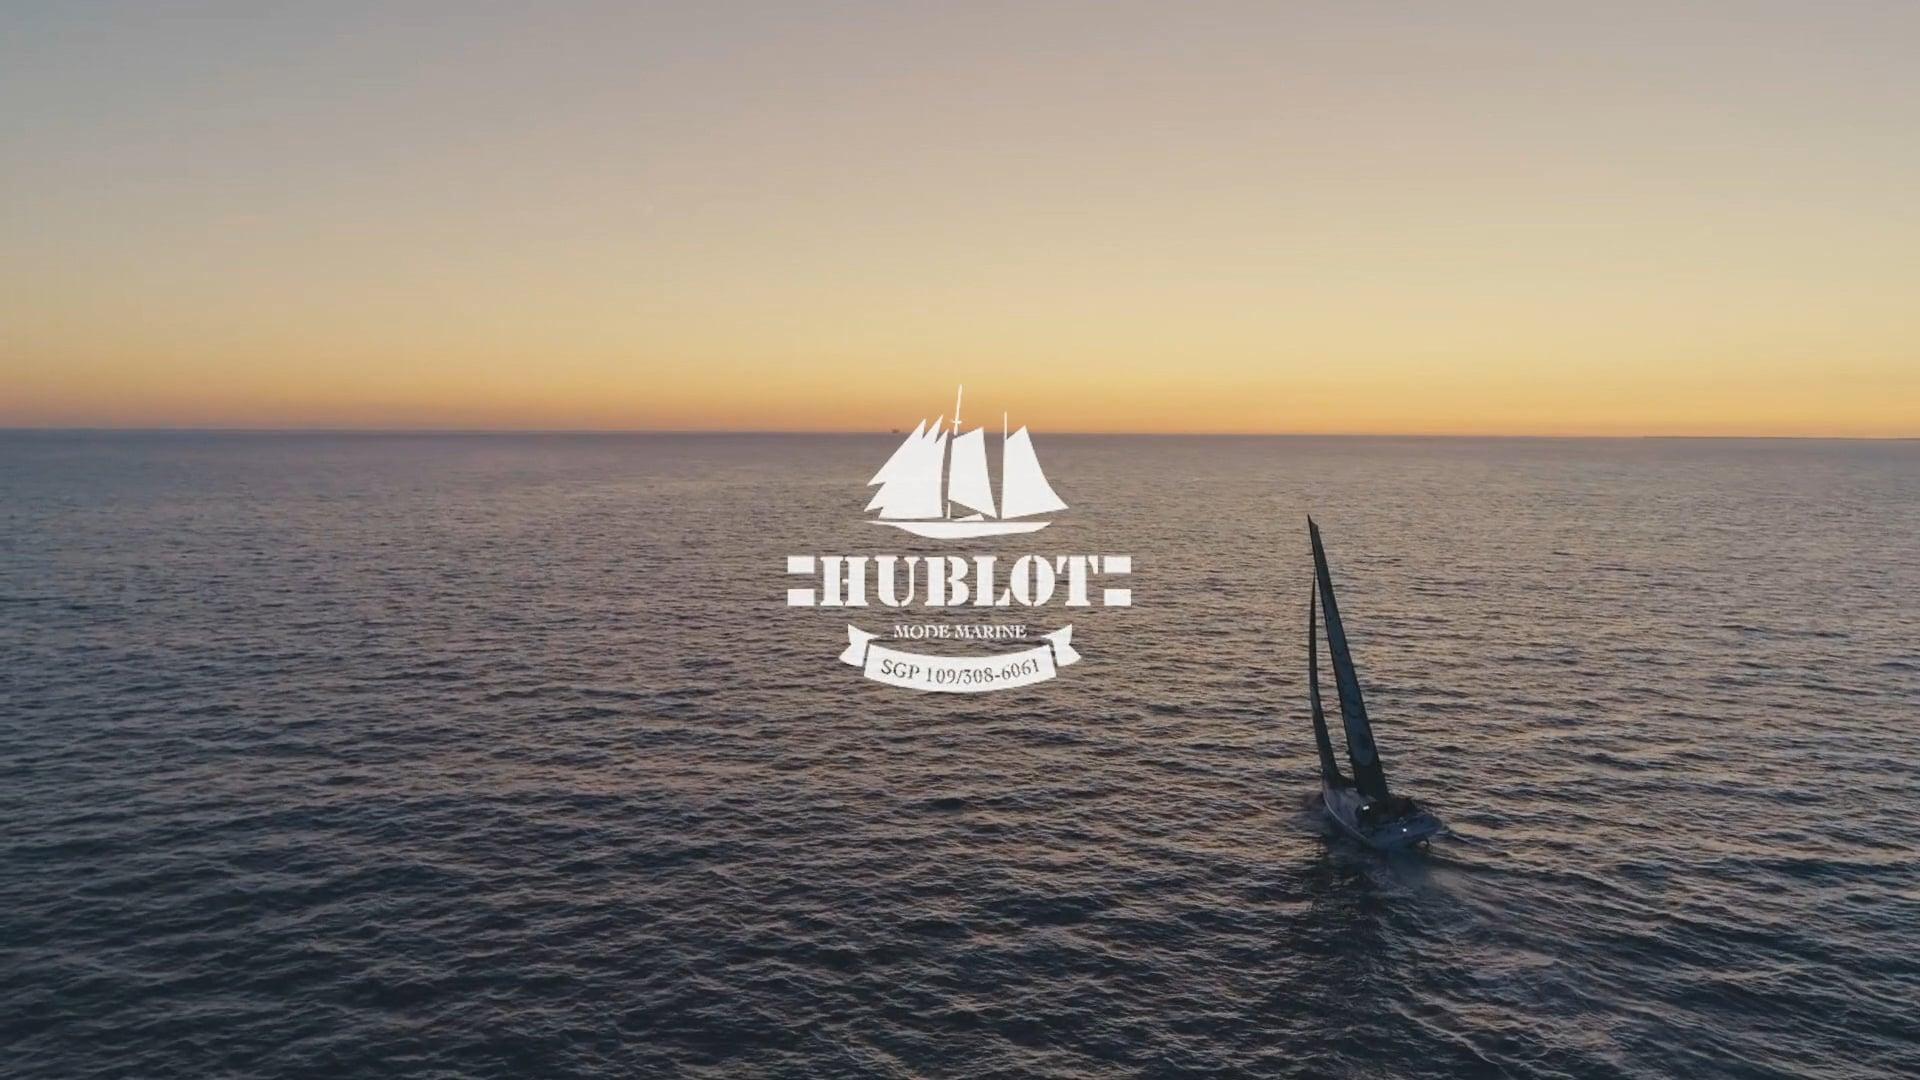 HUBLOT soutient Robin Marais - skipper lyonnais